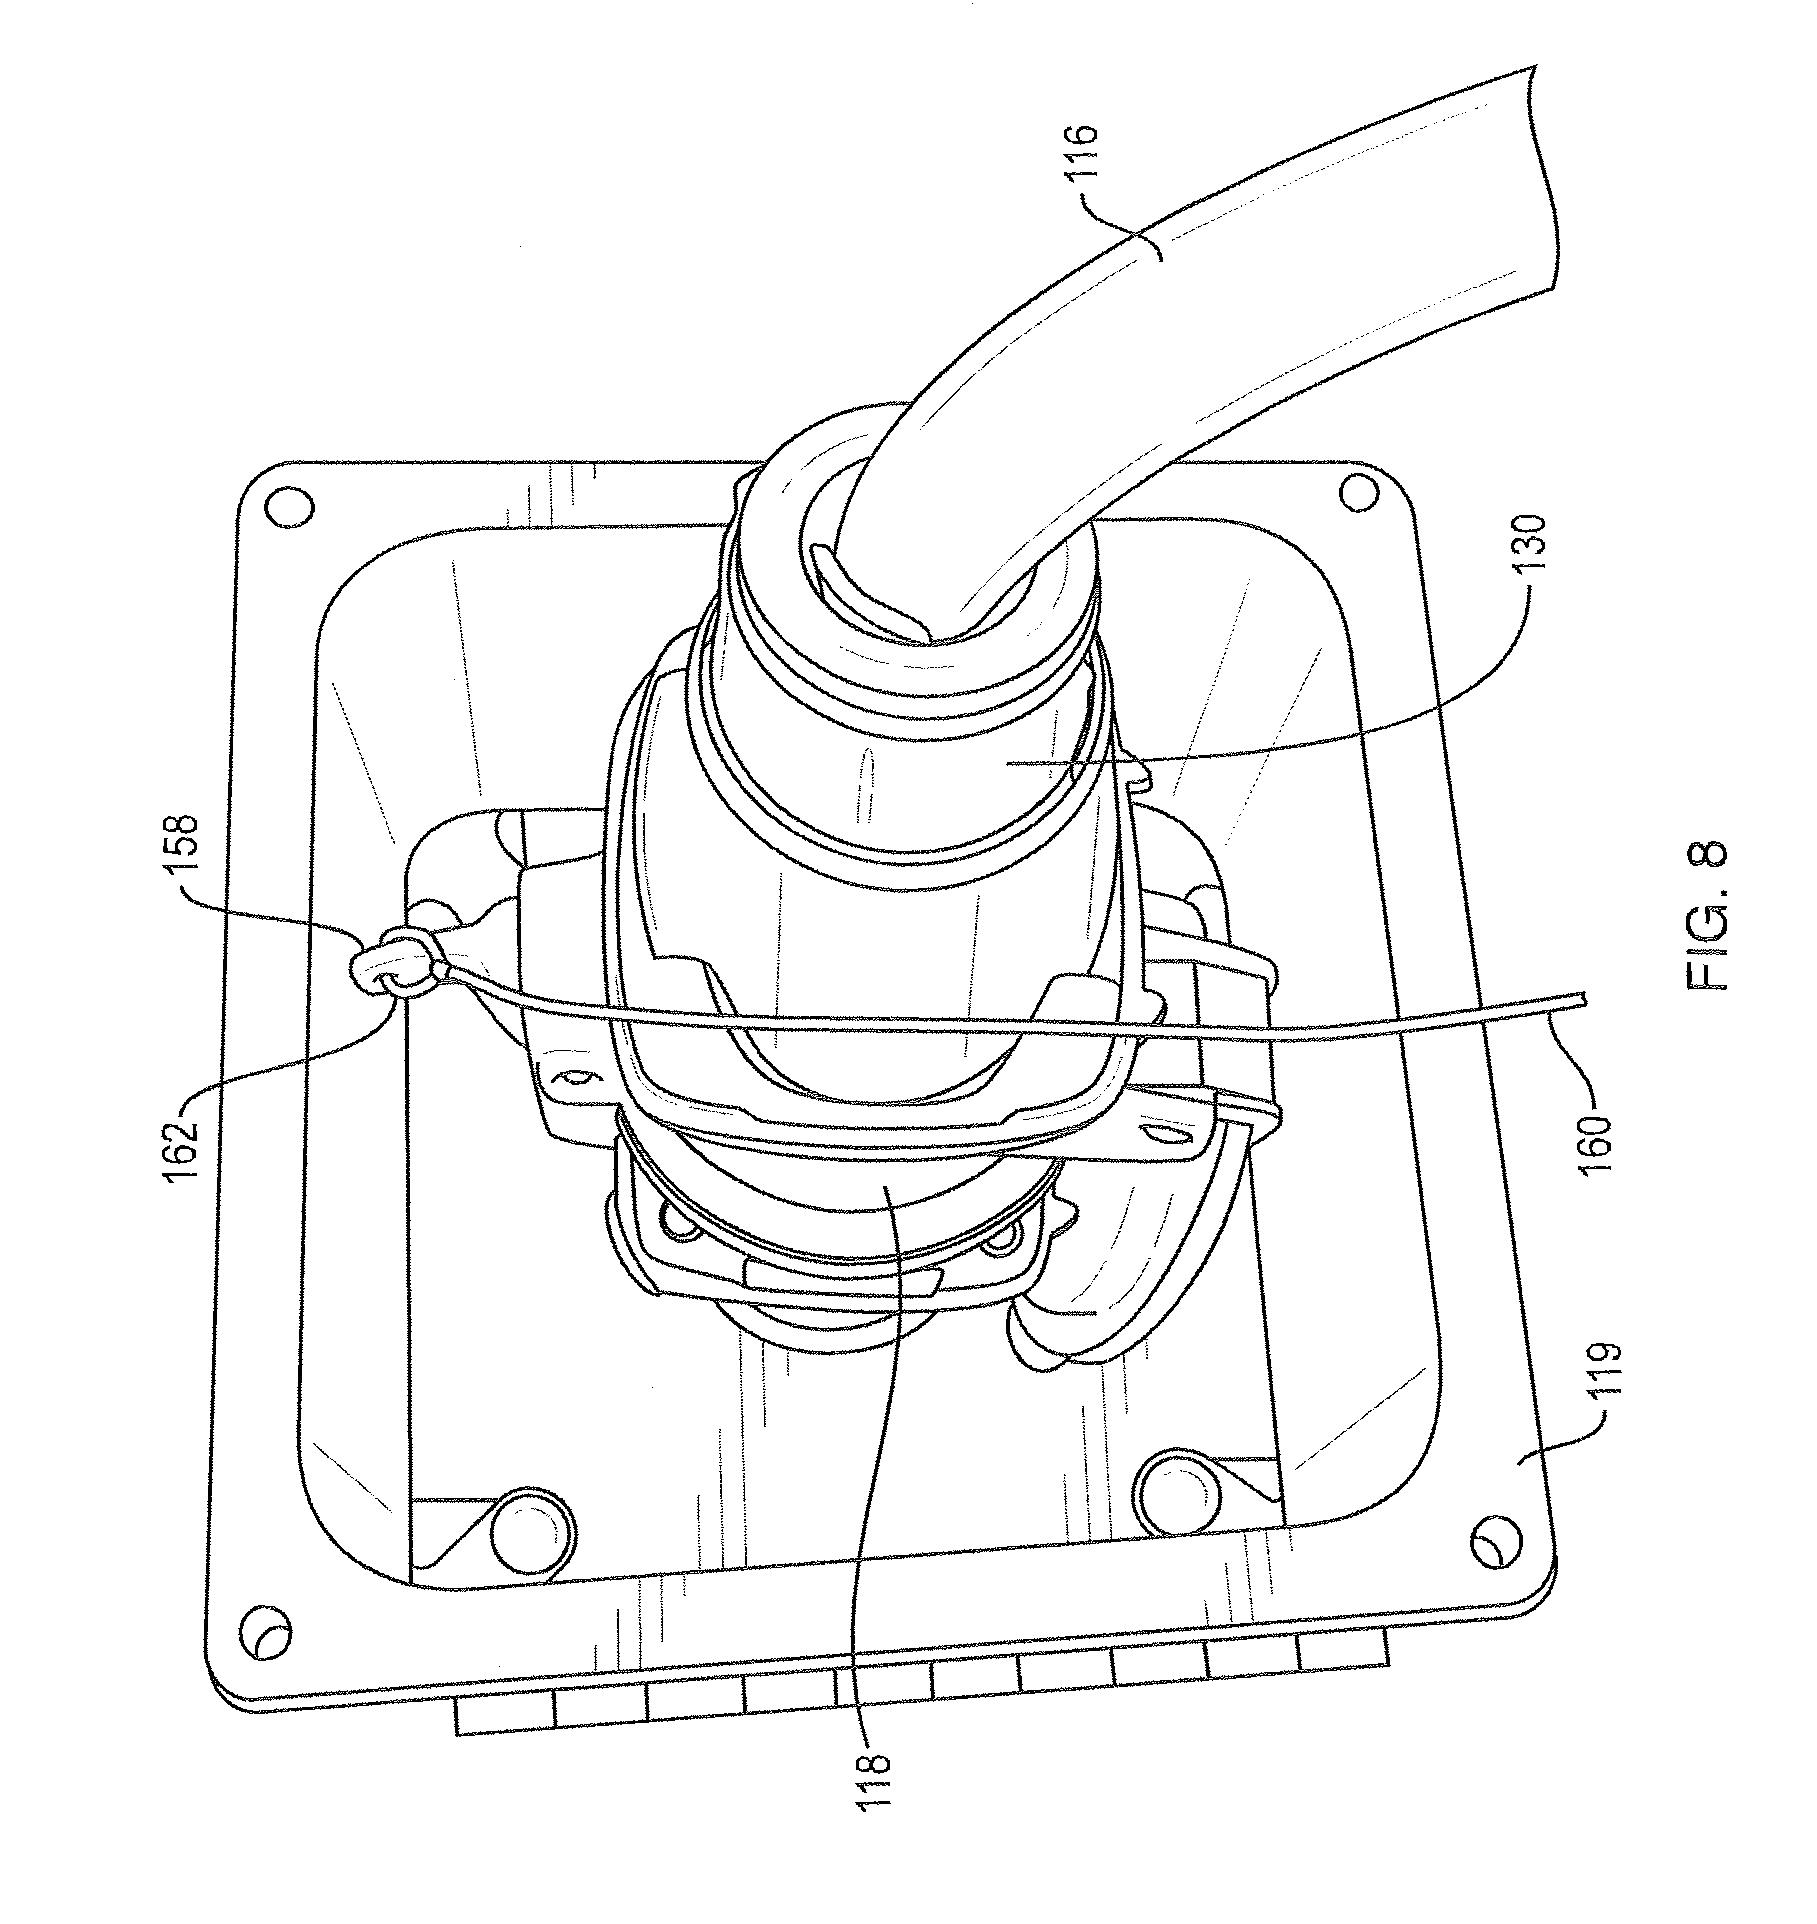 wabco air suspension wiring diagram 2000 jetta radio haldex trailer imageresizertool com